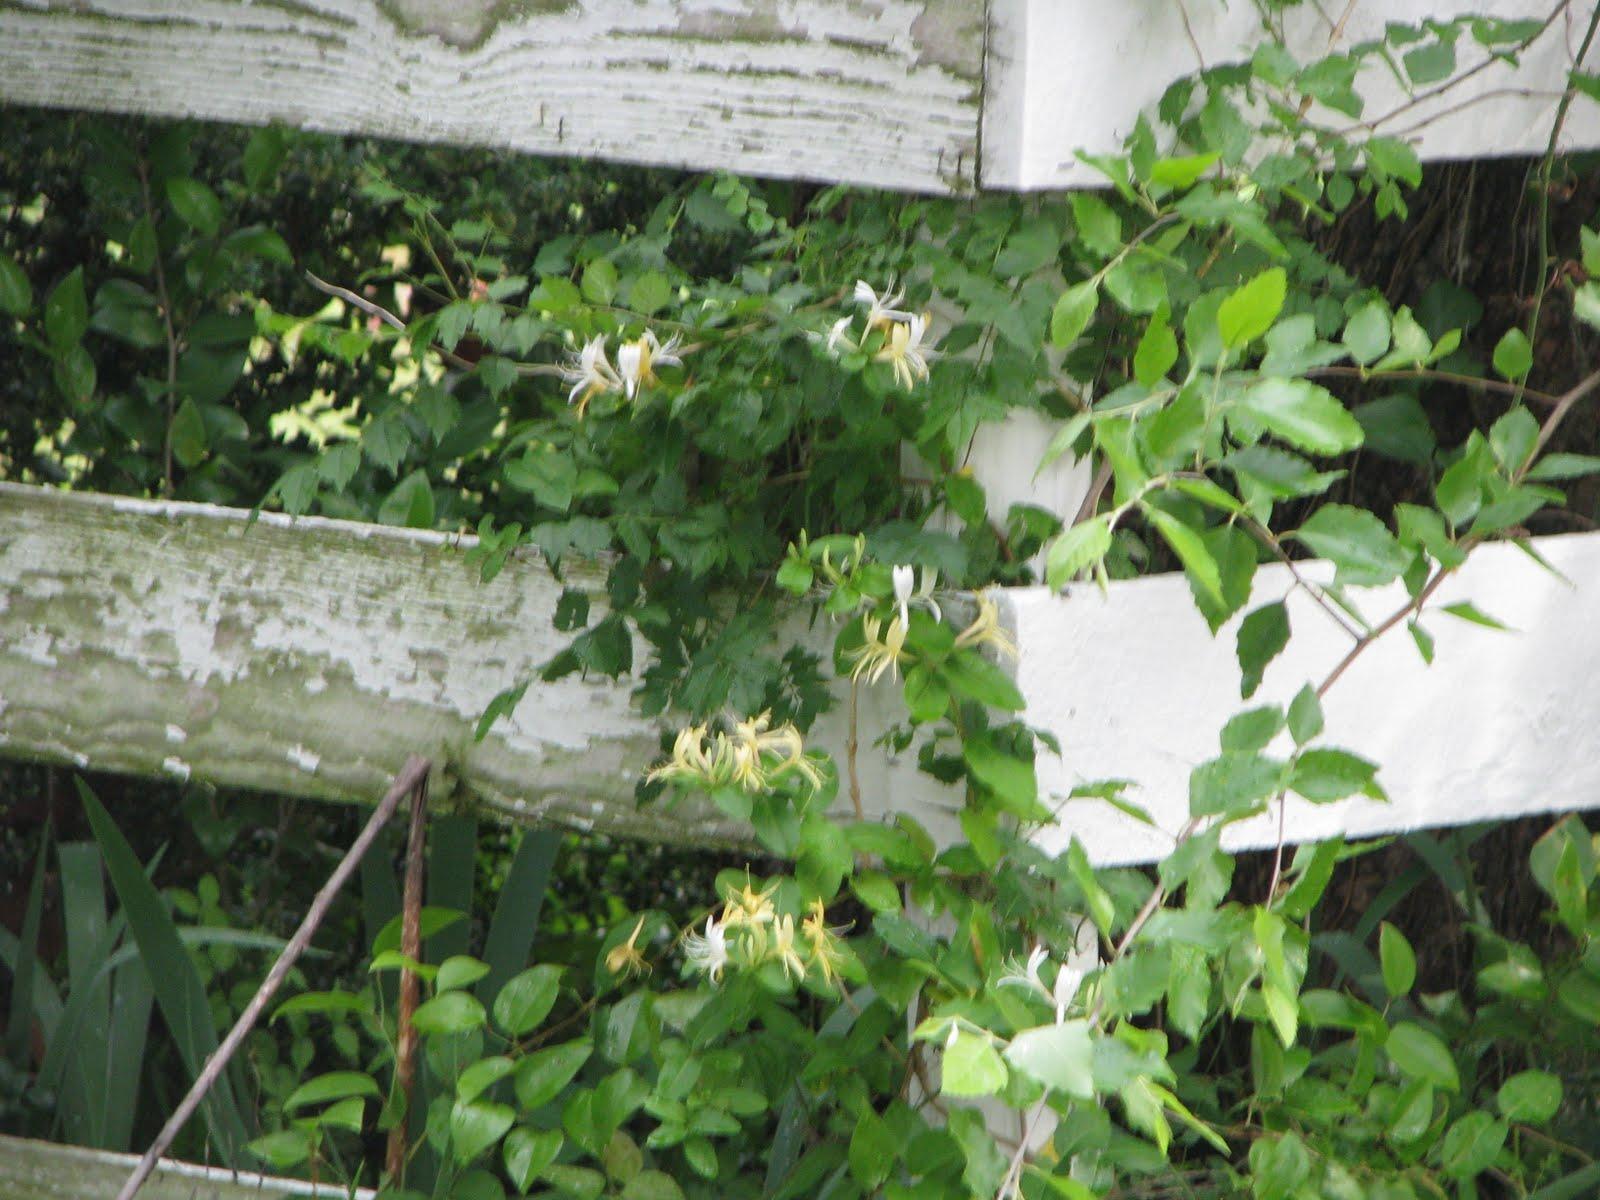 Hummingbird And Honeysuckle Tattoo Honeysuckle vine of vines were